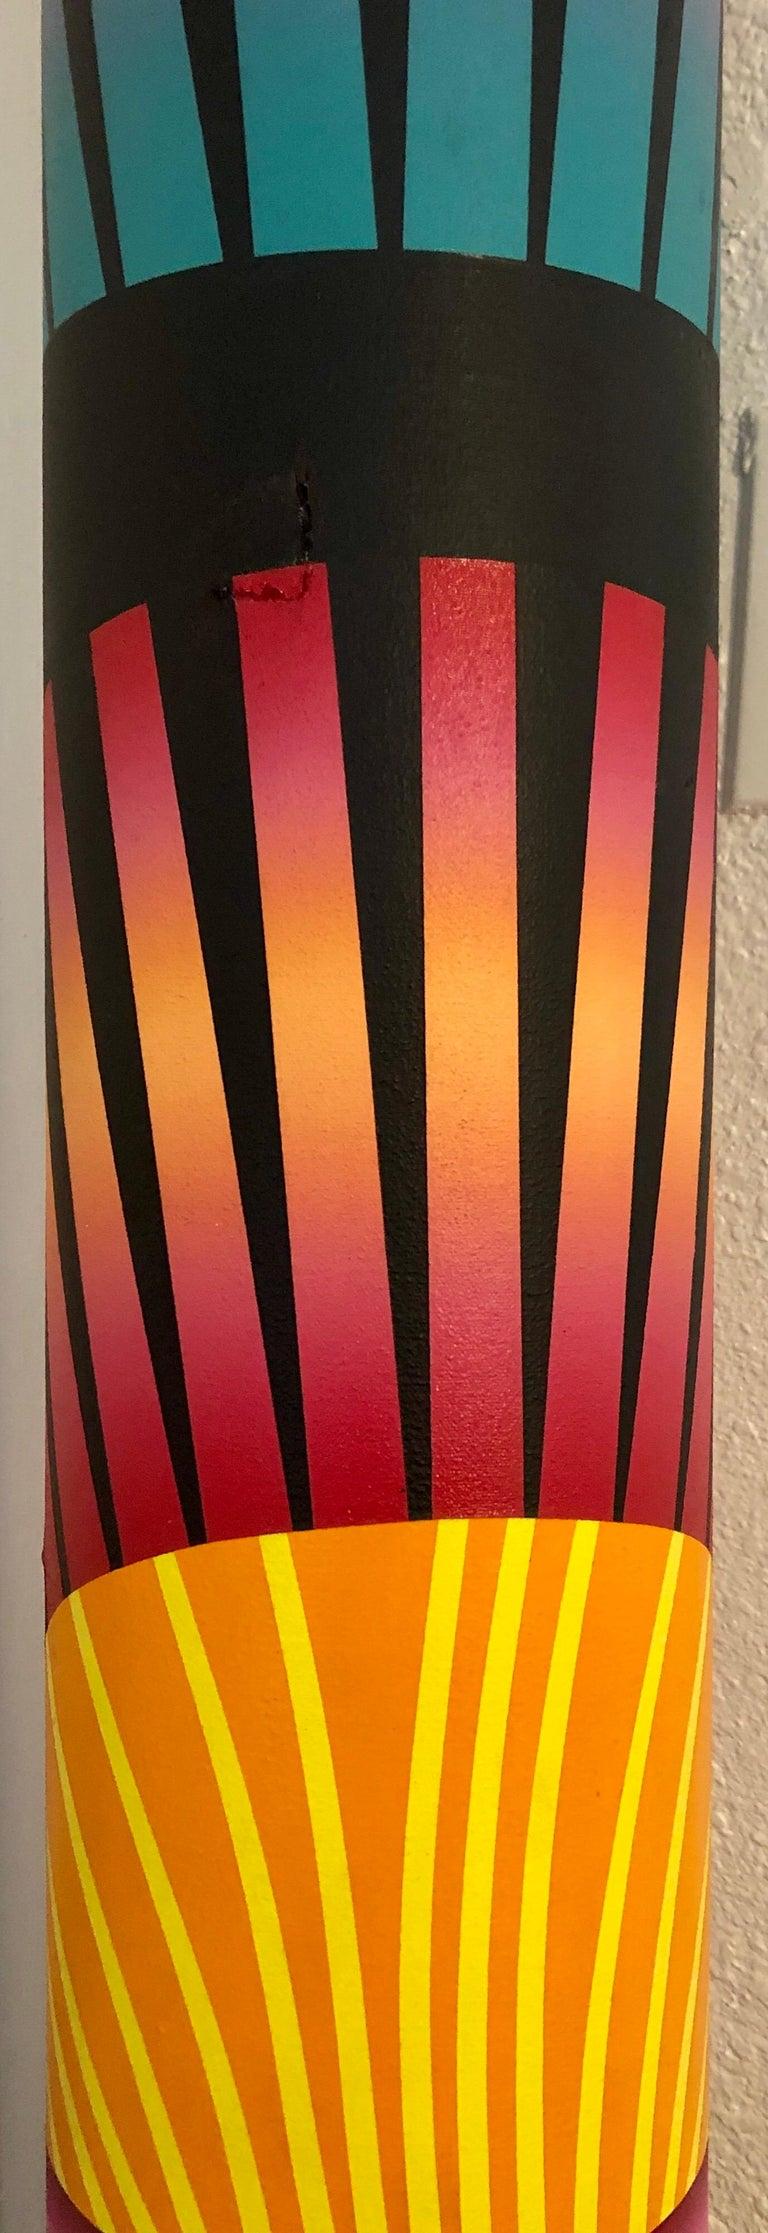 Abstract Geometric Shaped Canvas Painting Sculpture Memphis Milano Era 1980s Art 14